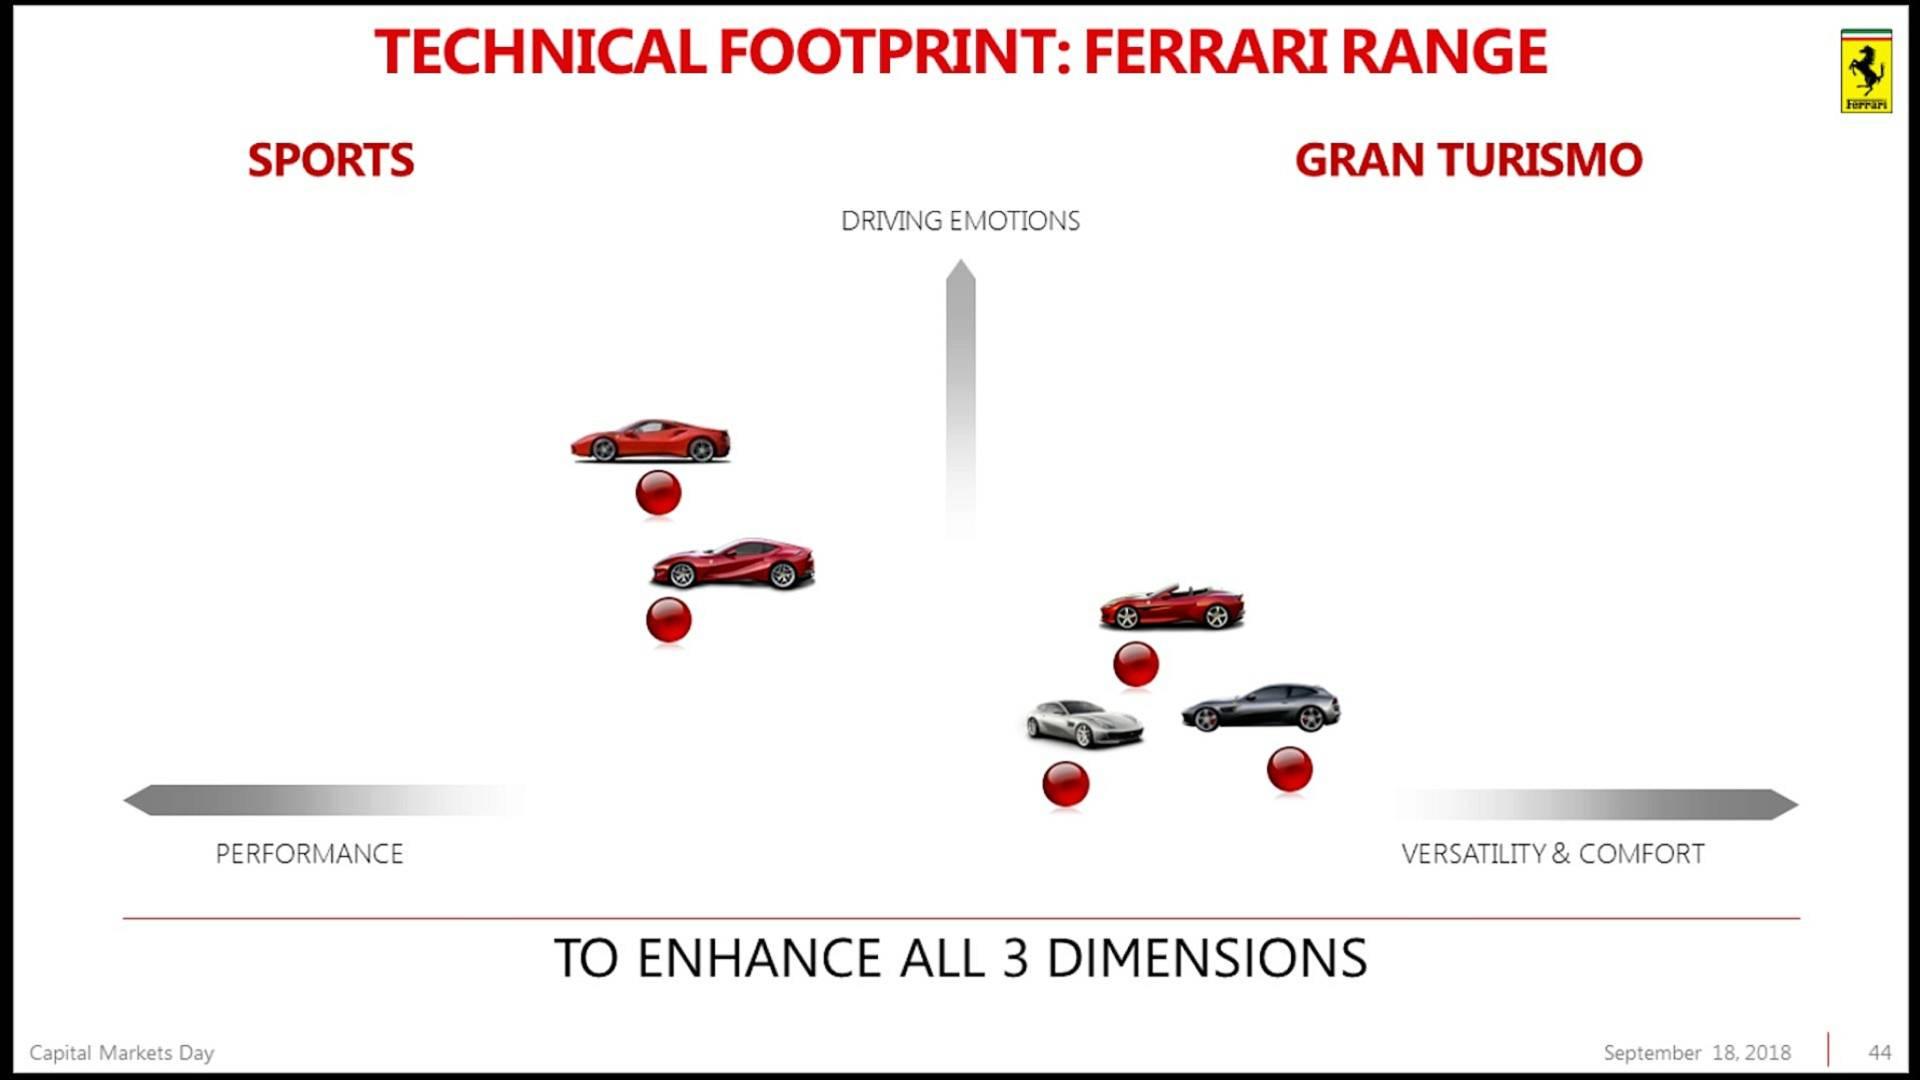 Piano Industriale Ferrari 2018-2022 (60)